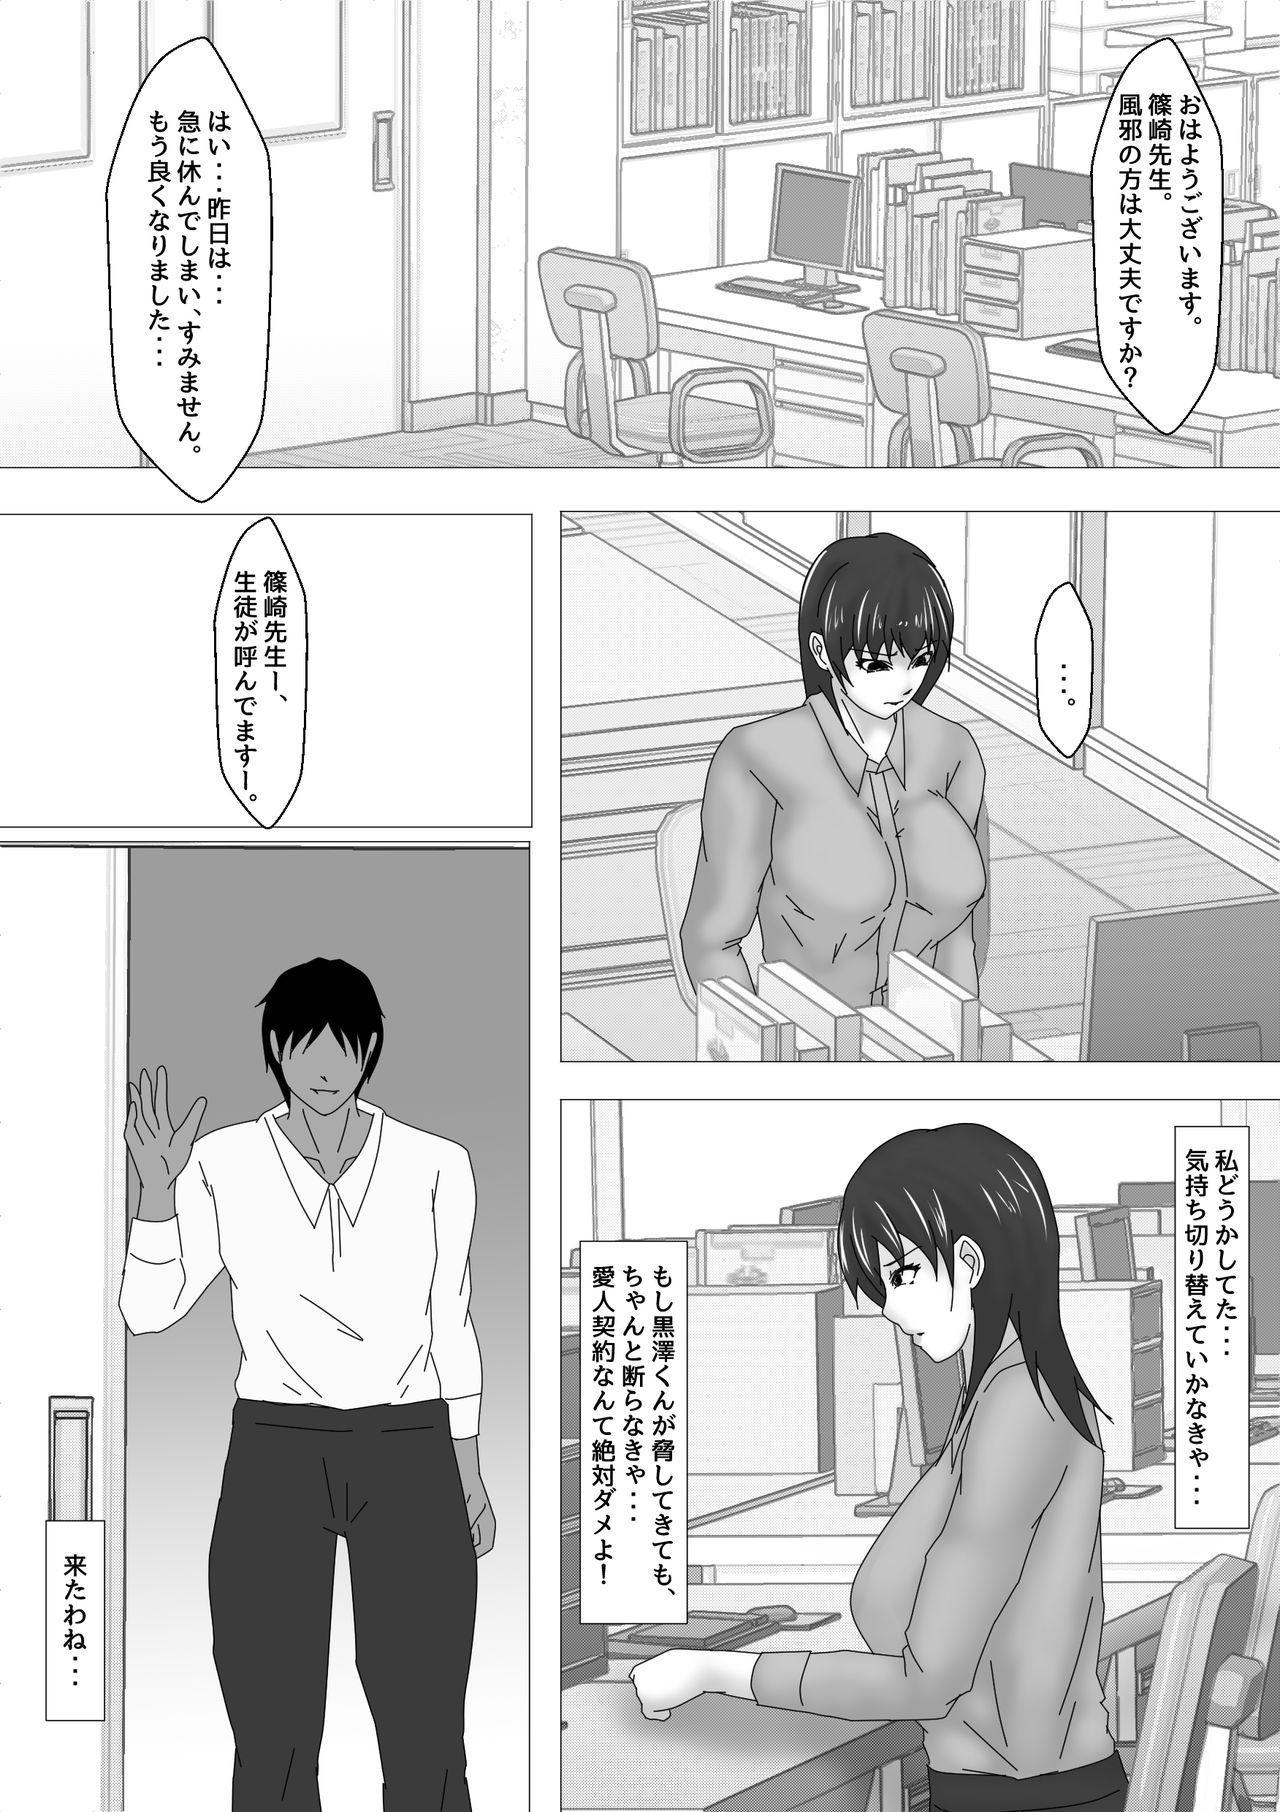 Jokyoushi Shinozaki Rin no Choukyou Kiroku Dai 3 Zenhan | Female Teacher Rin Shinozaki's Training Record 3 First Half 11